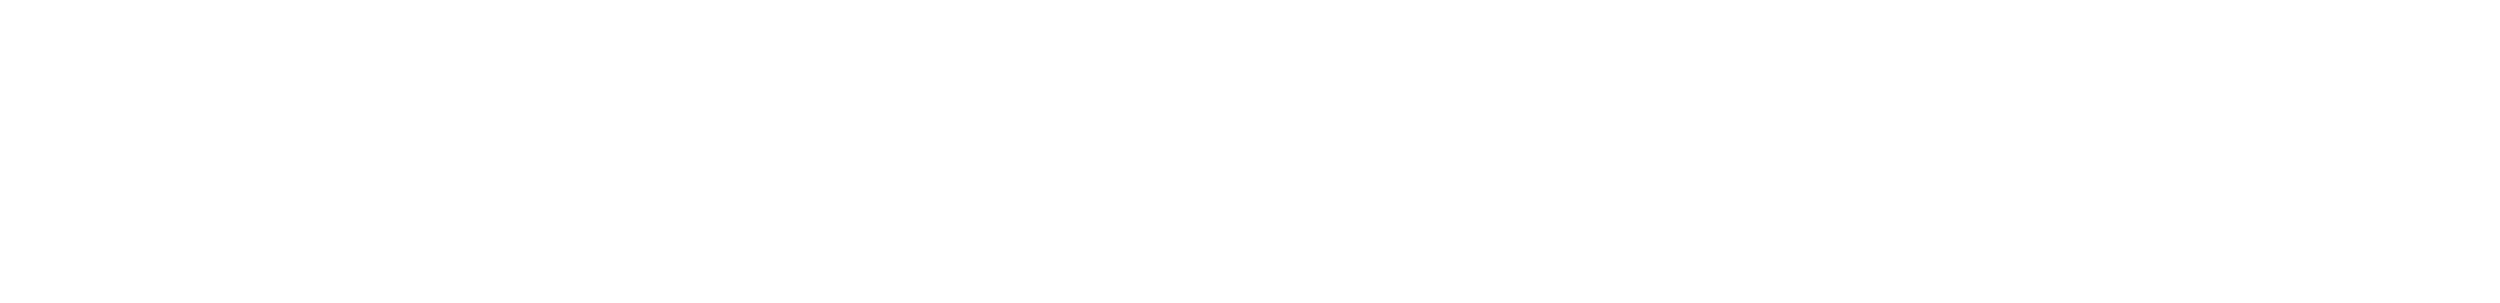 top-tekst-white_1_linje.png